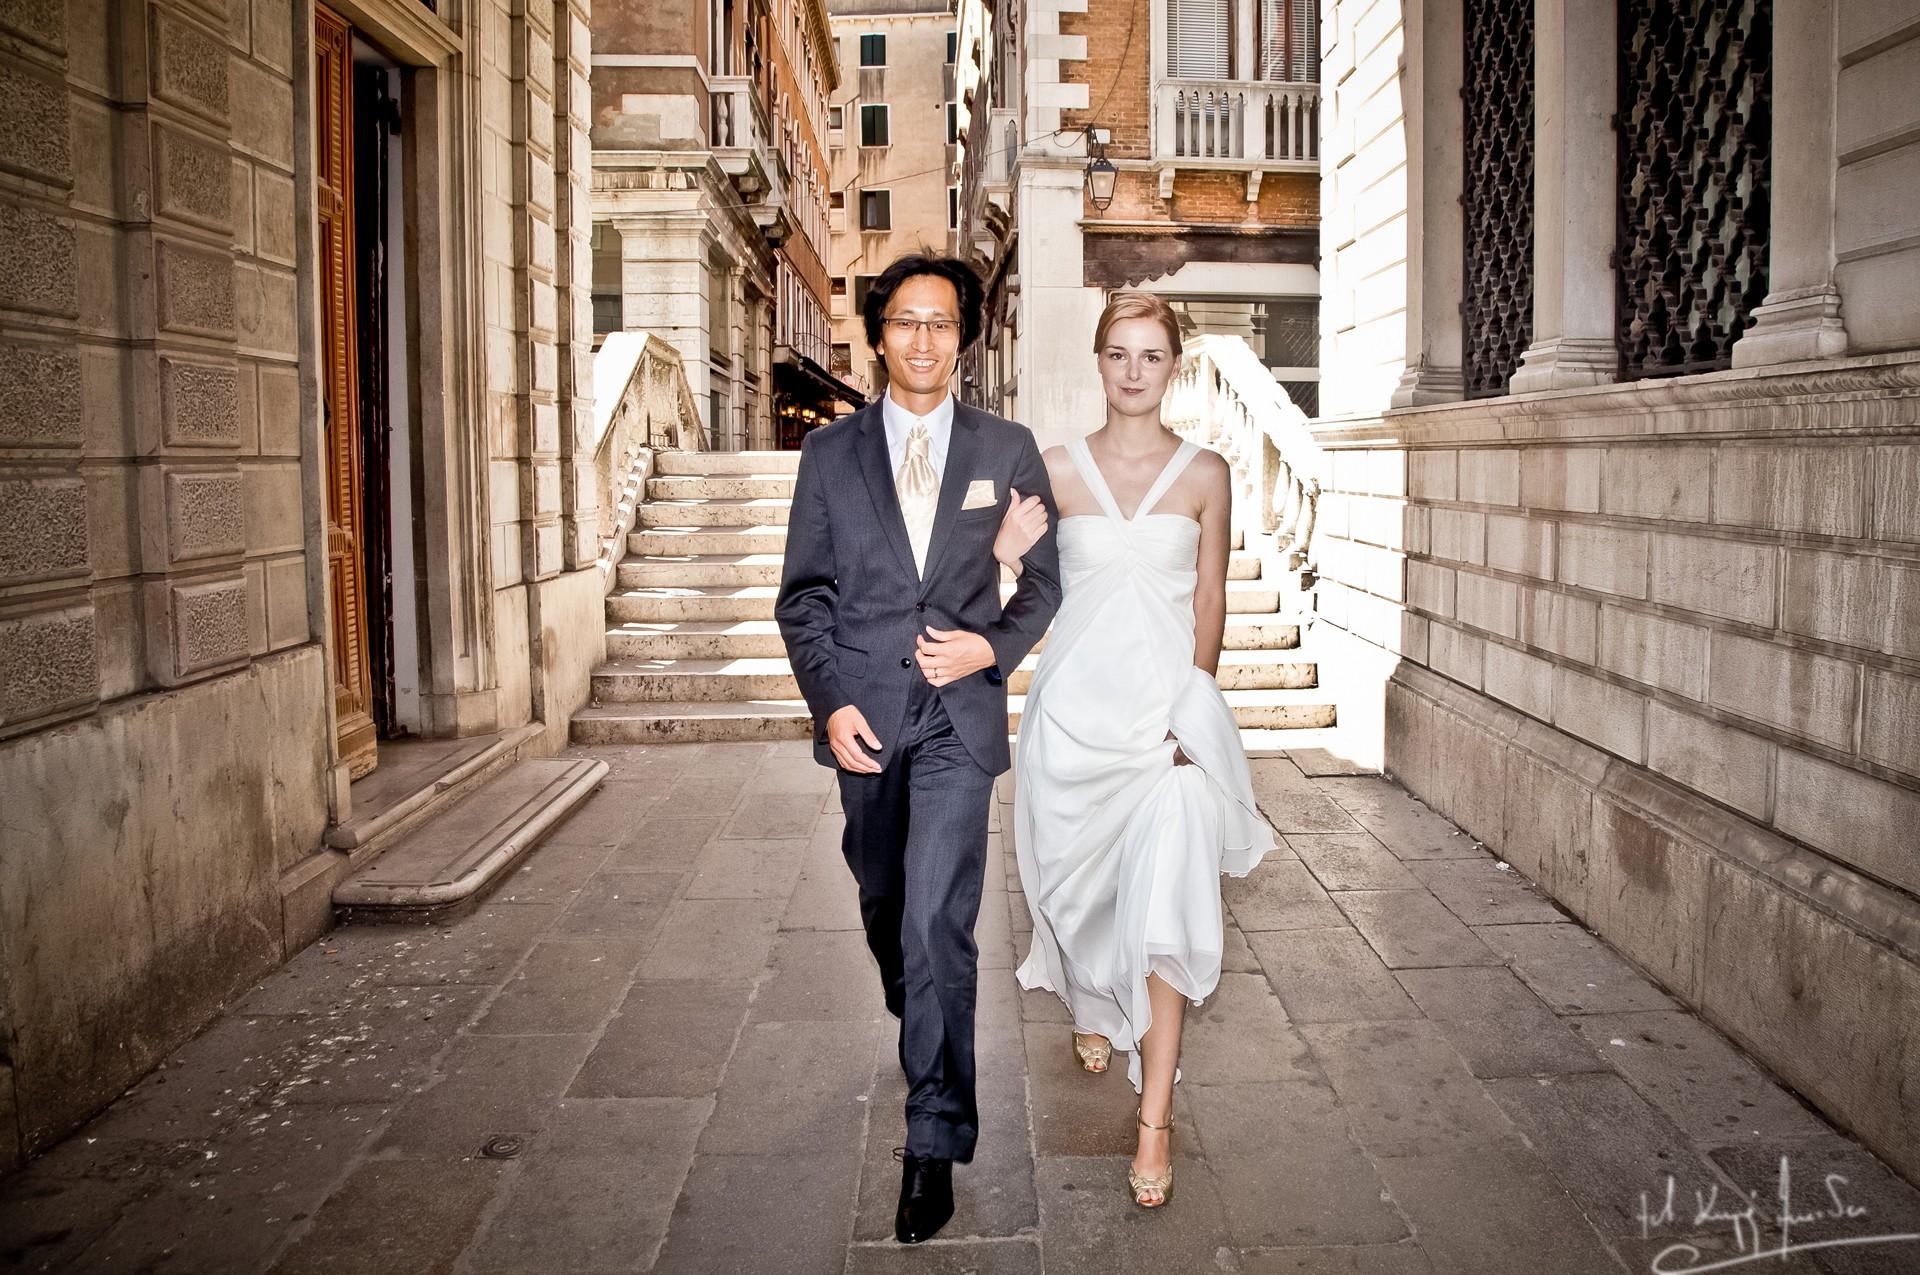 Ślub w wenecji 48 Manuela Luiza & Young Seon Song